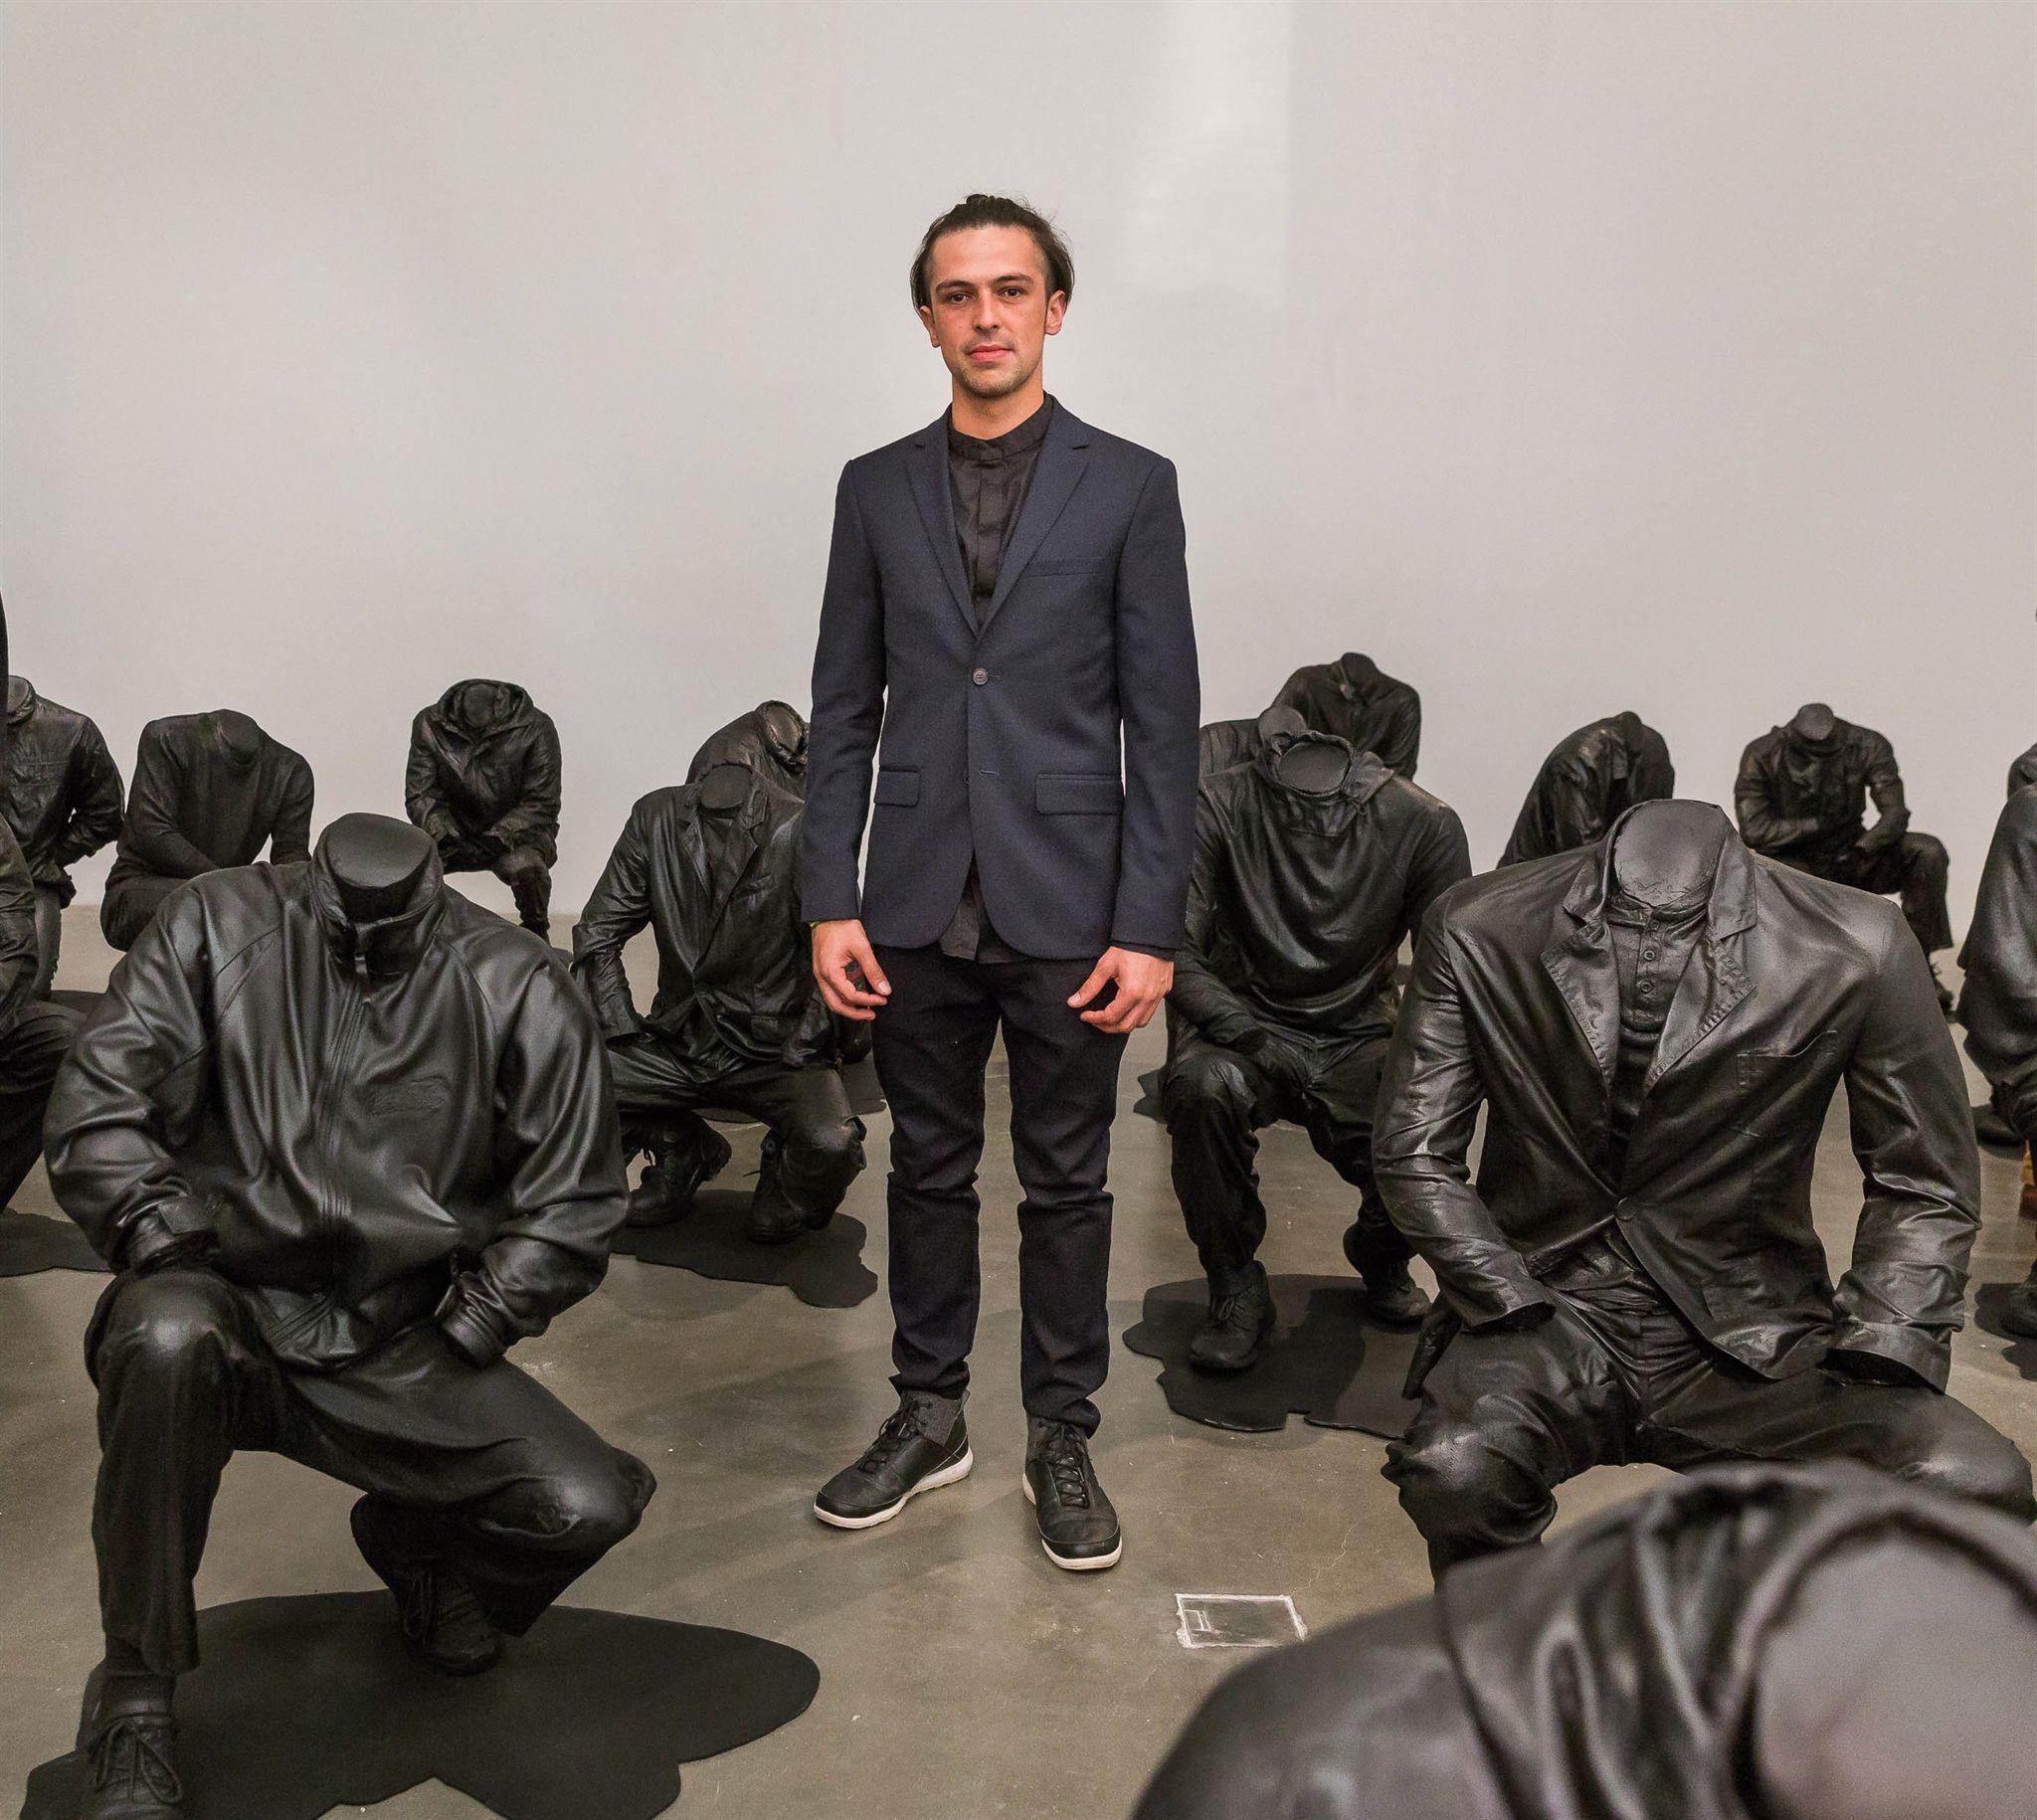 Haroon Gunn-salie Wins The 2018 Fnb Art Prize photo